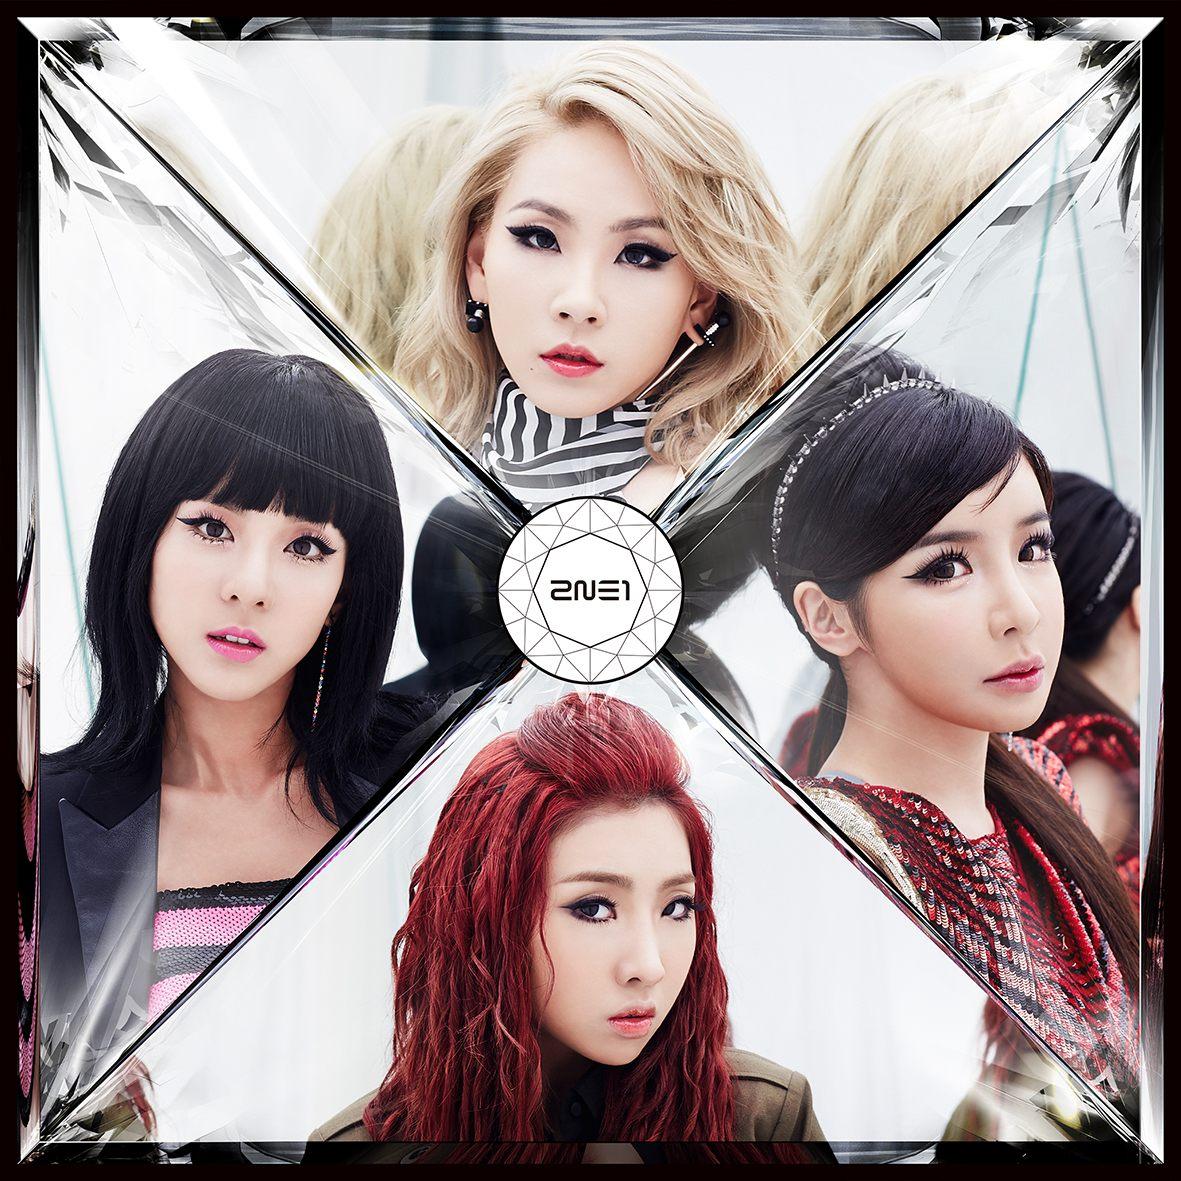 2NE1 dating 2014